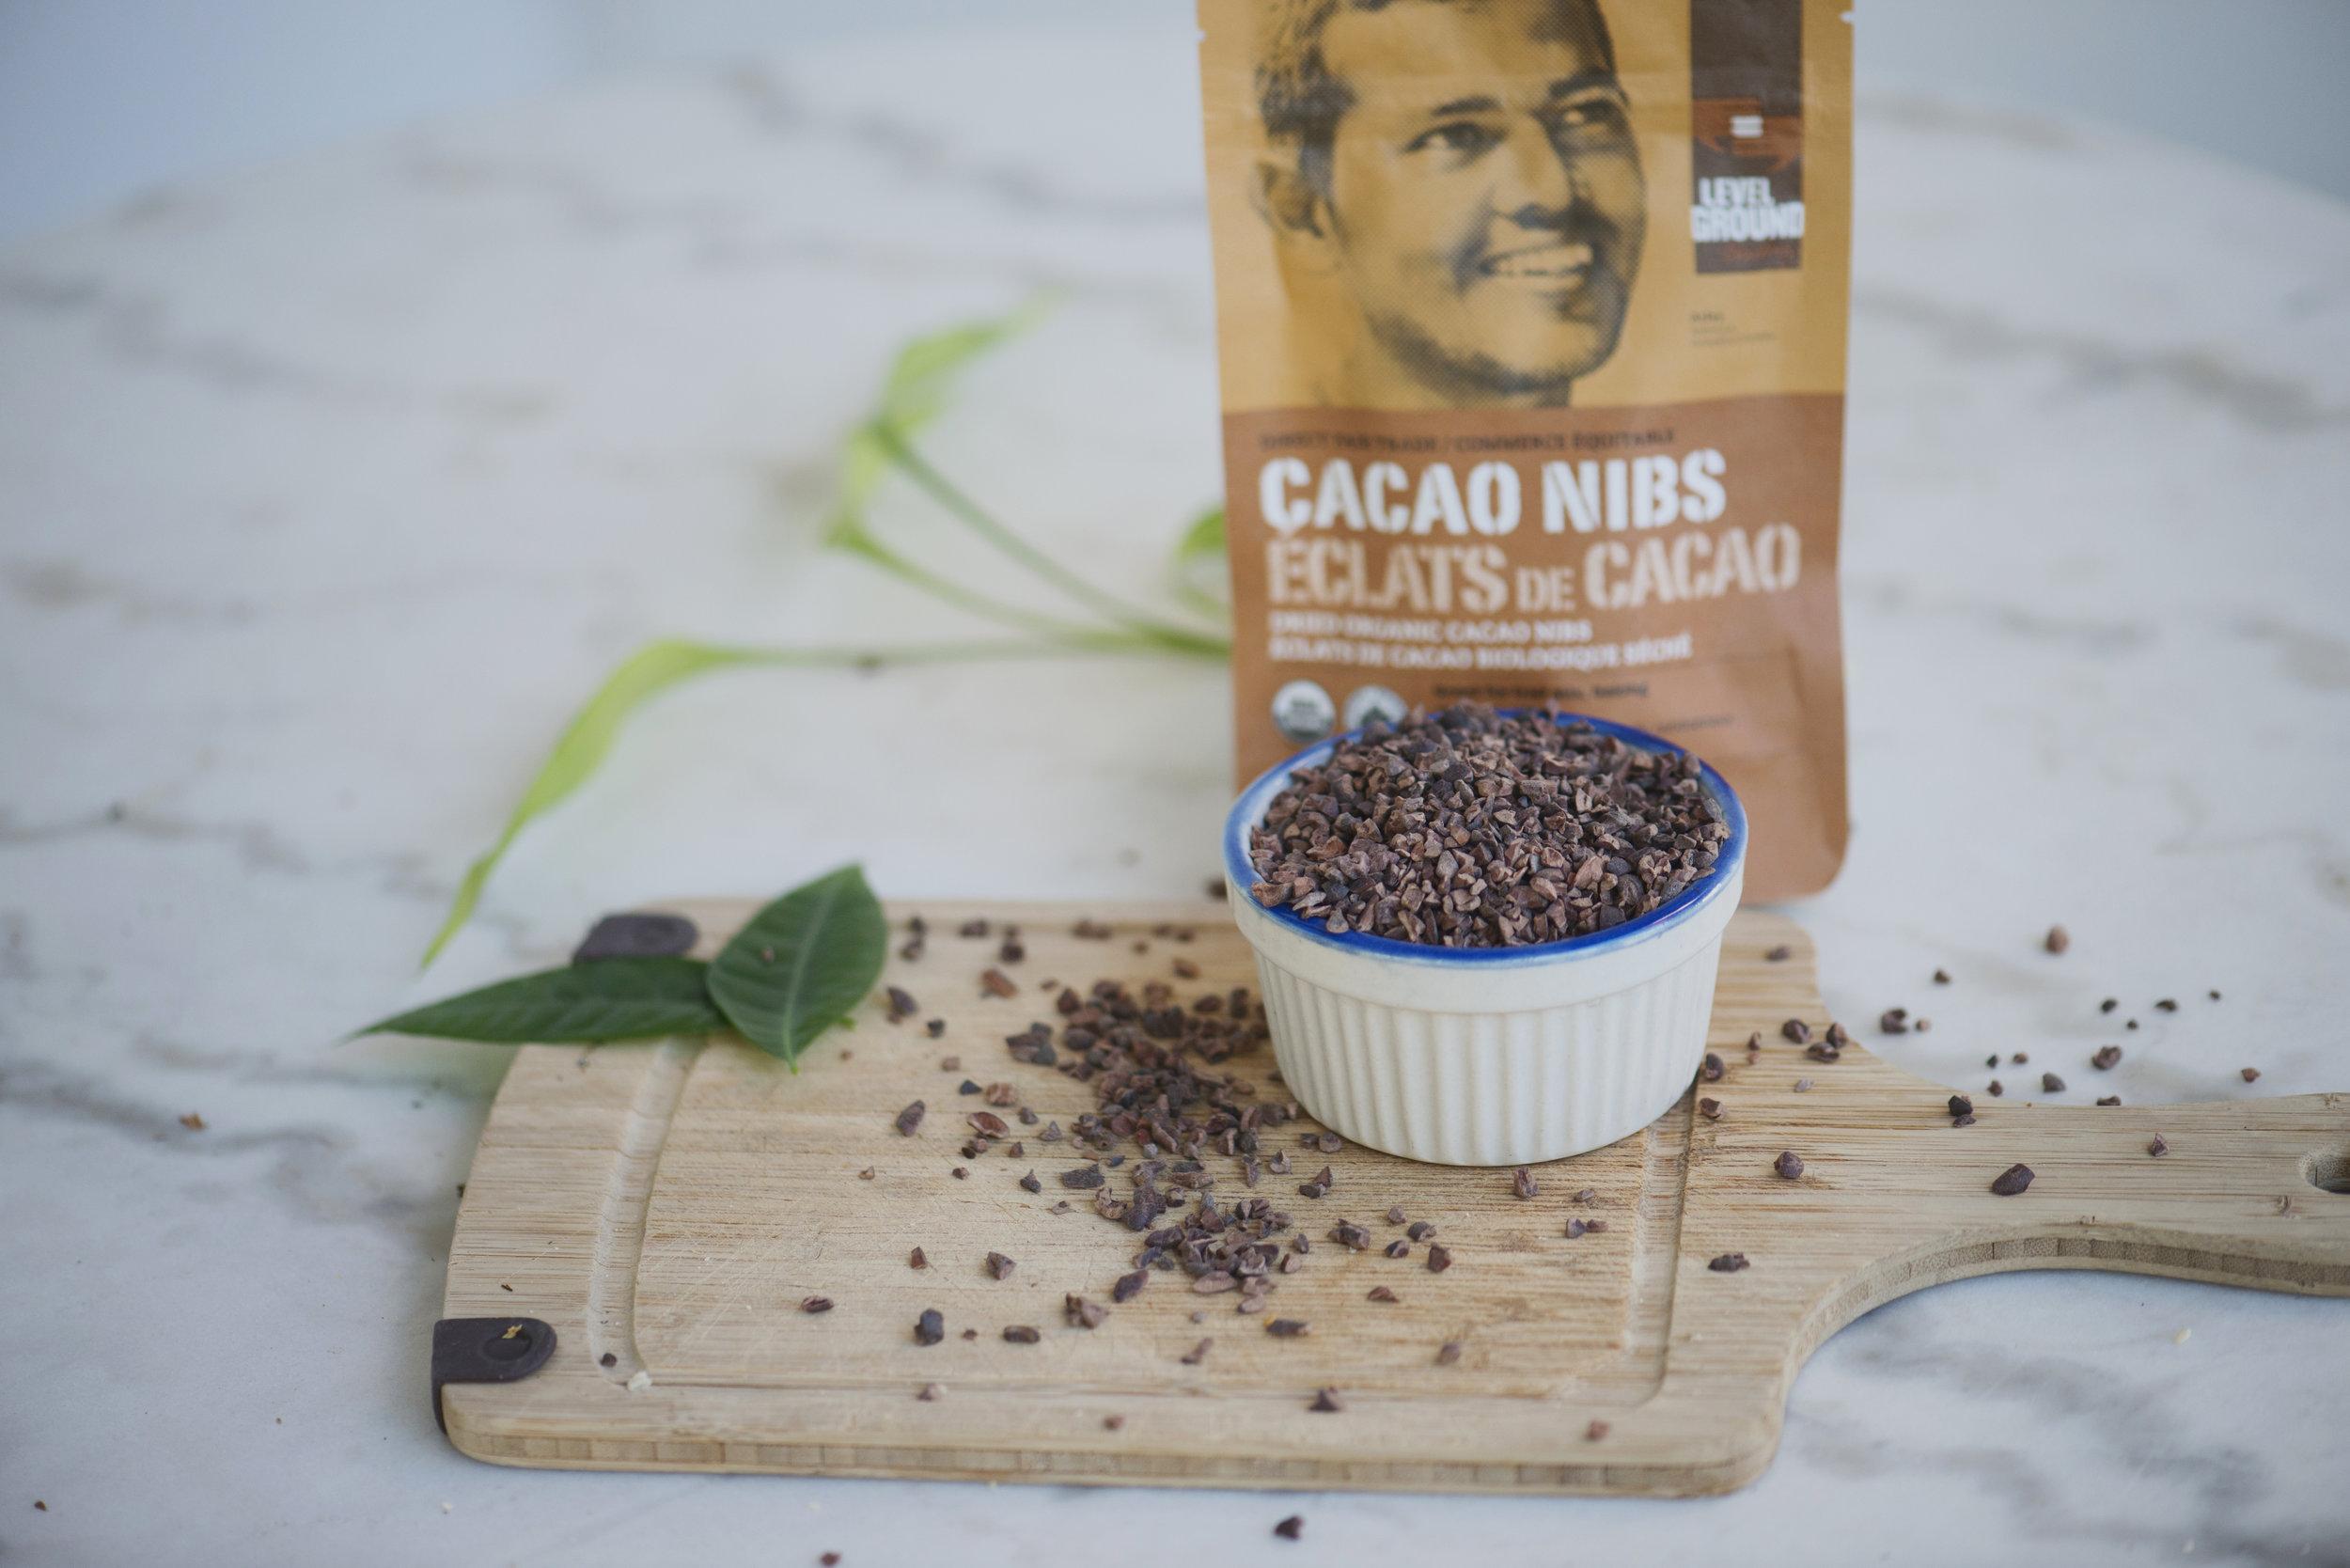 Cacao Nib packaging